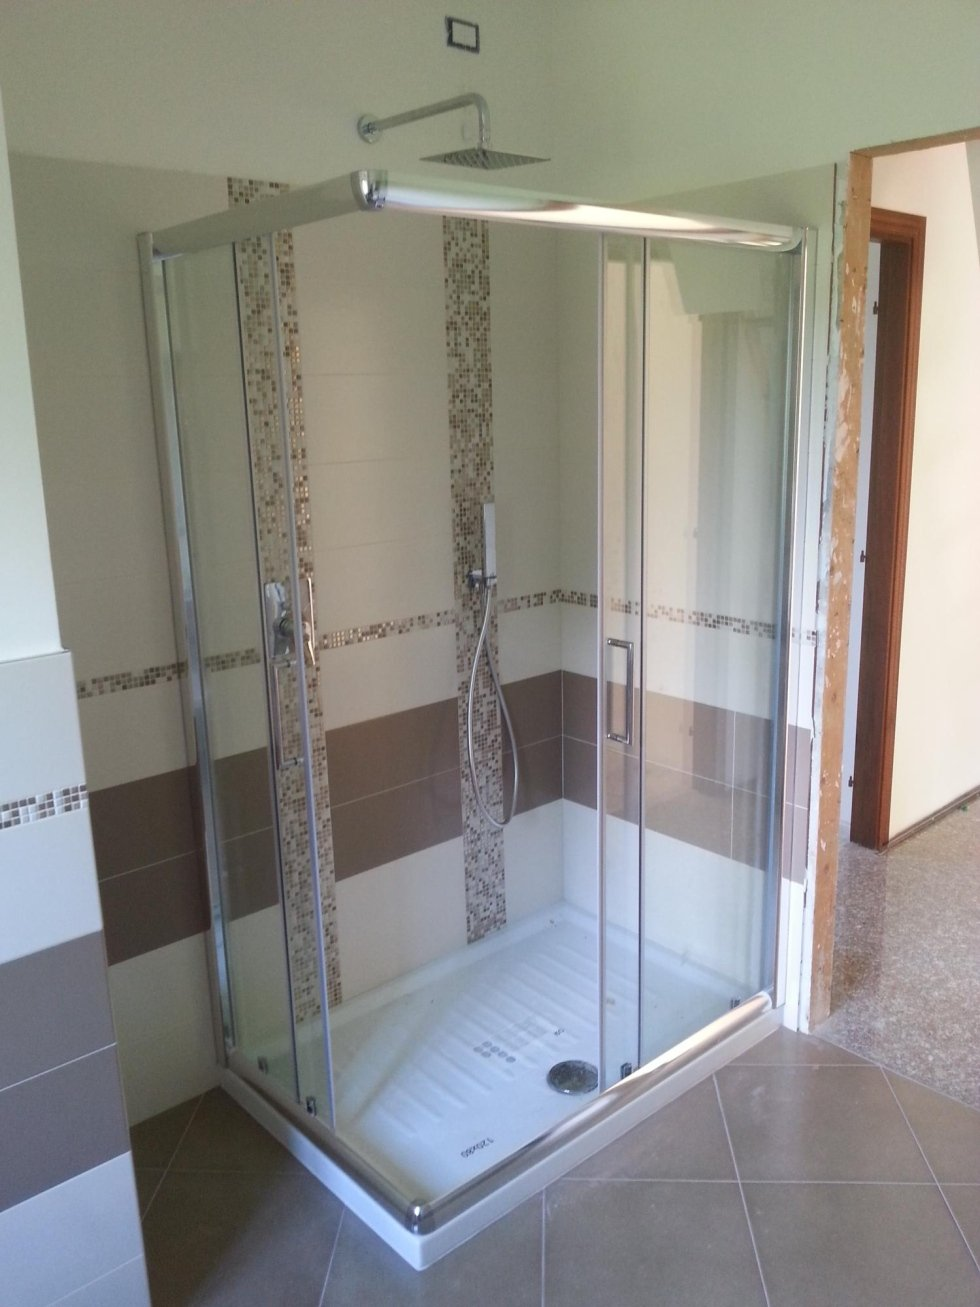 manutenzioni idrauliche